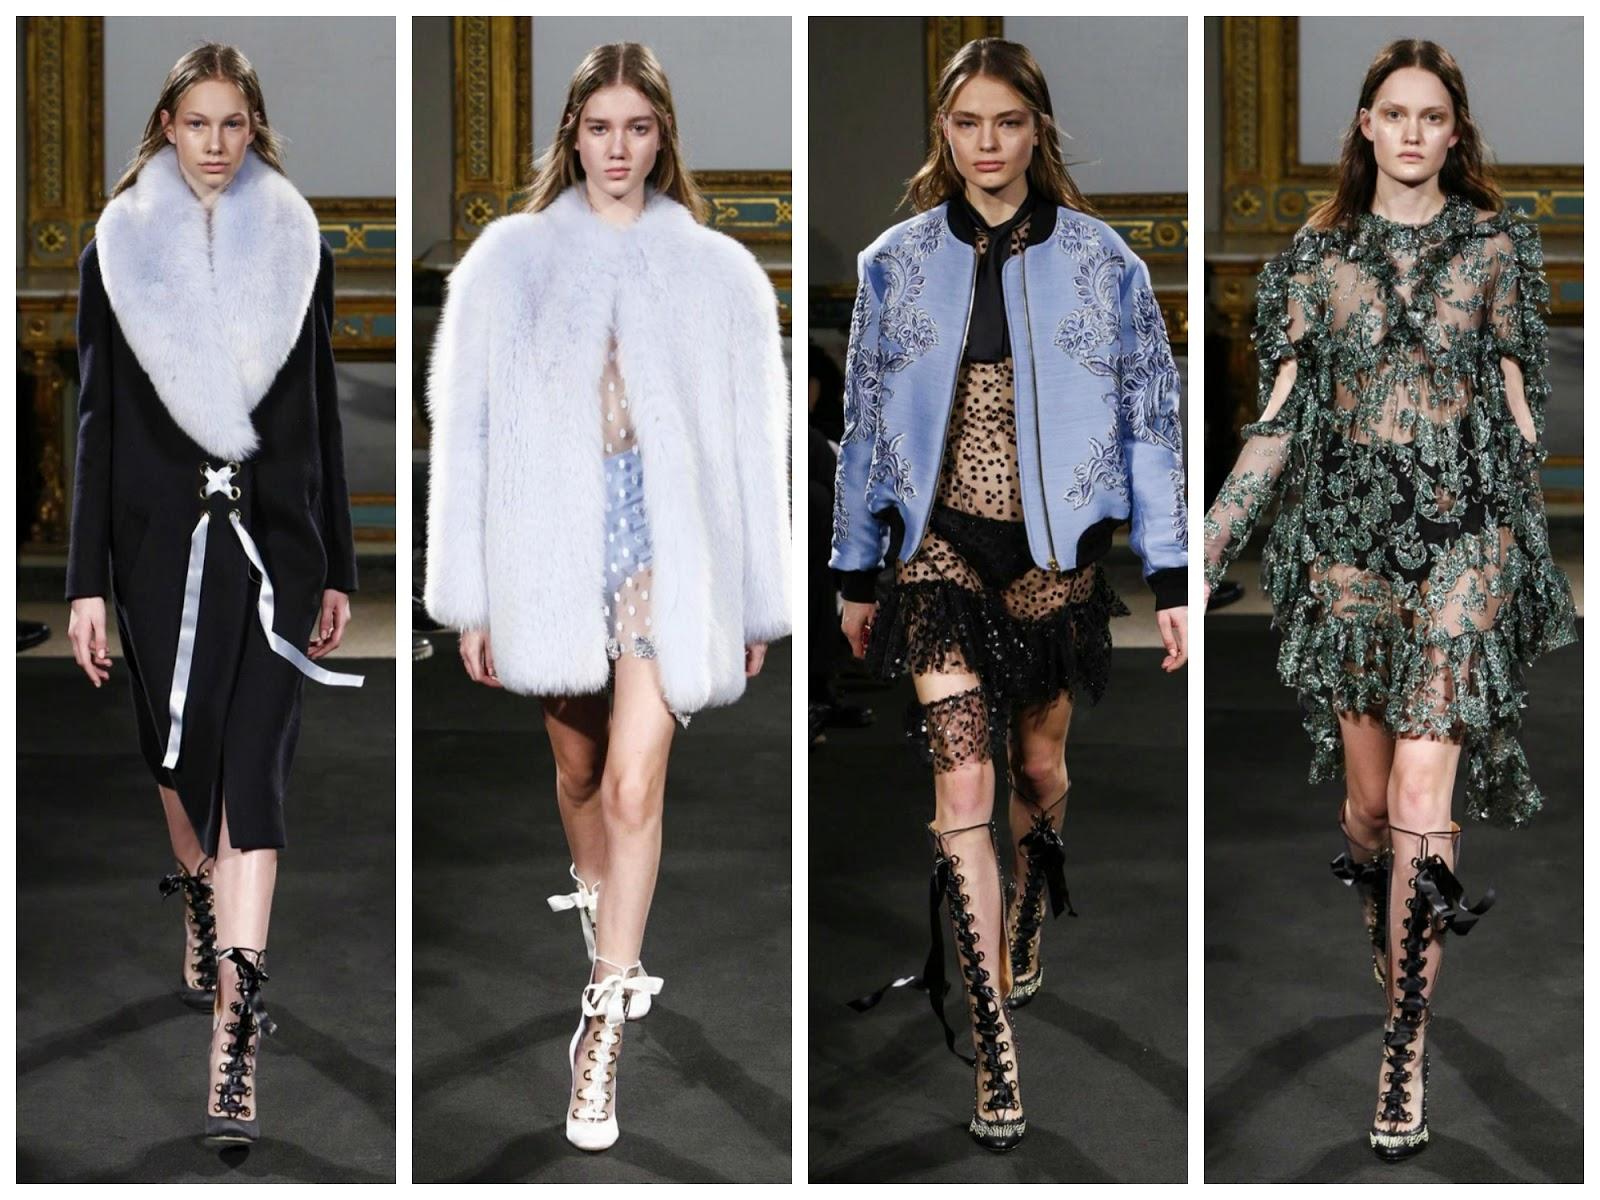 francesco-scognamiglio-fall-winter-2016-fashion-show-milan